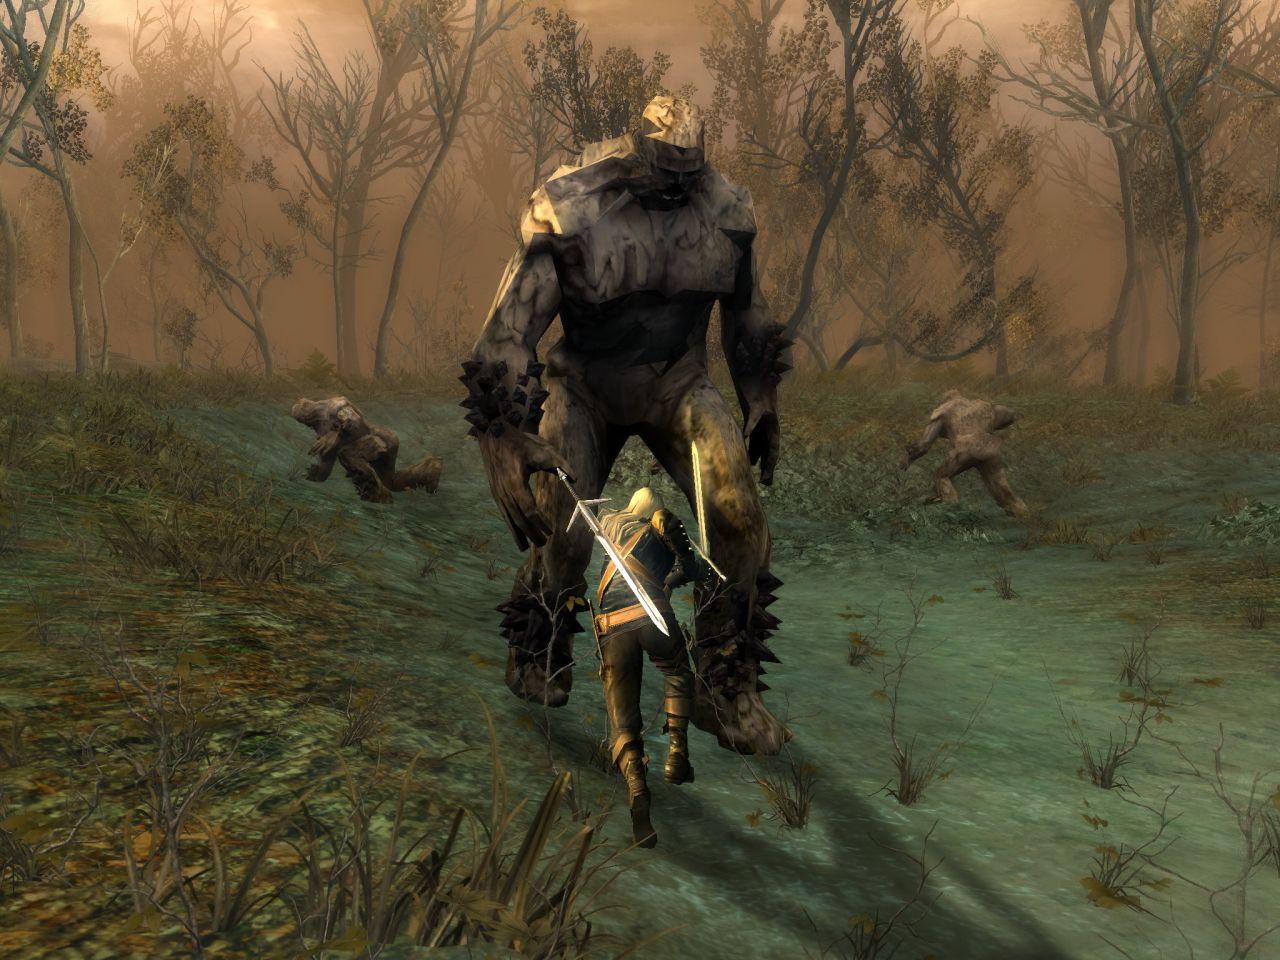 The Witcher screenshot